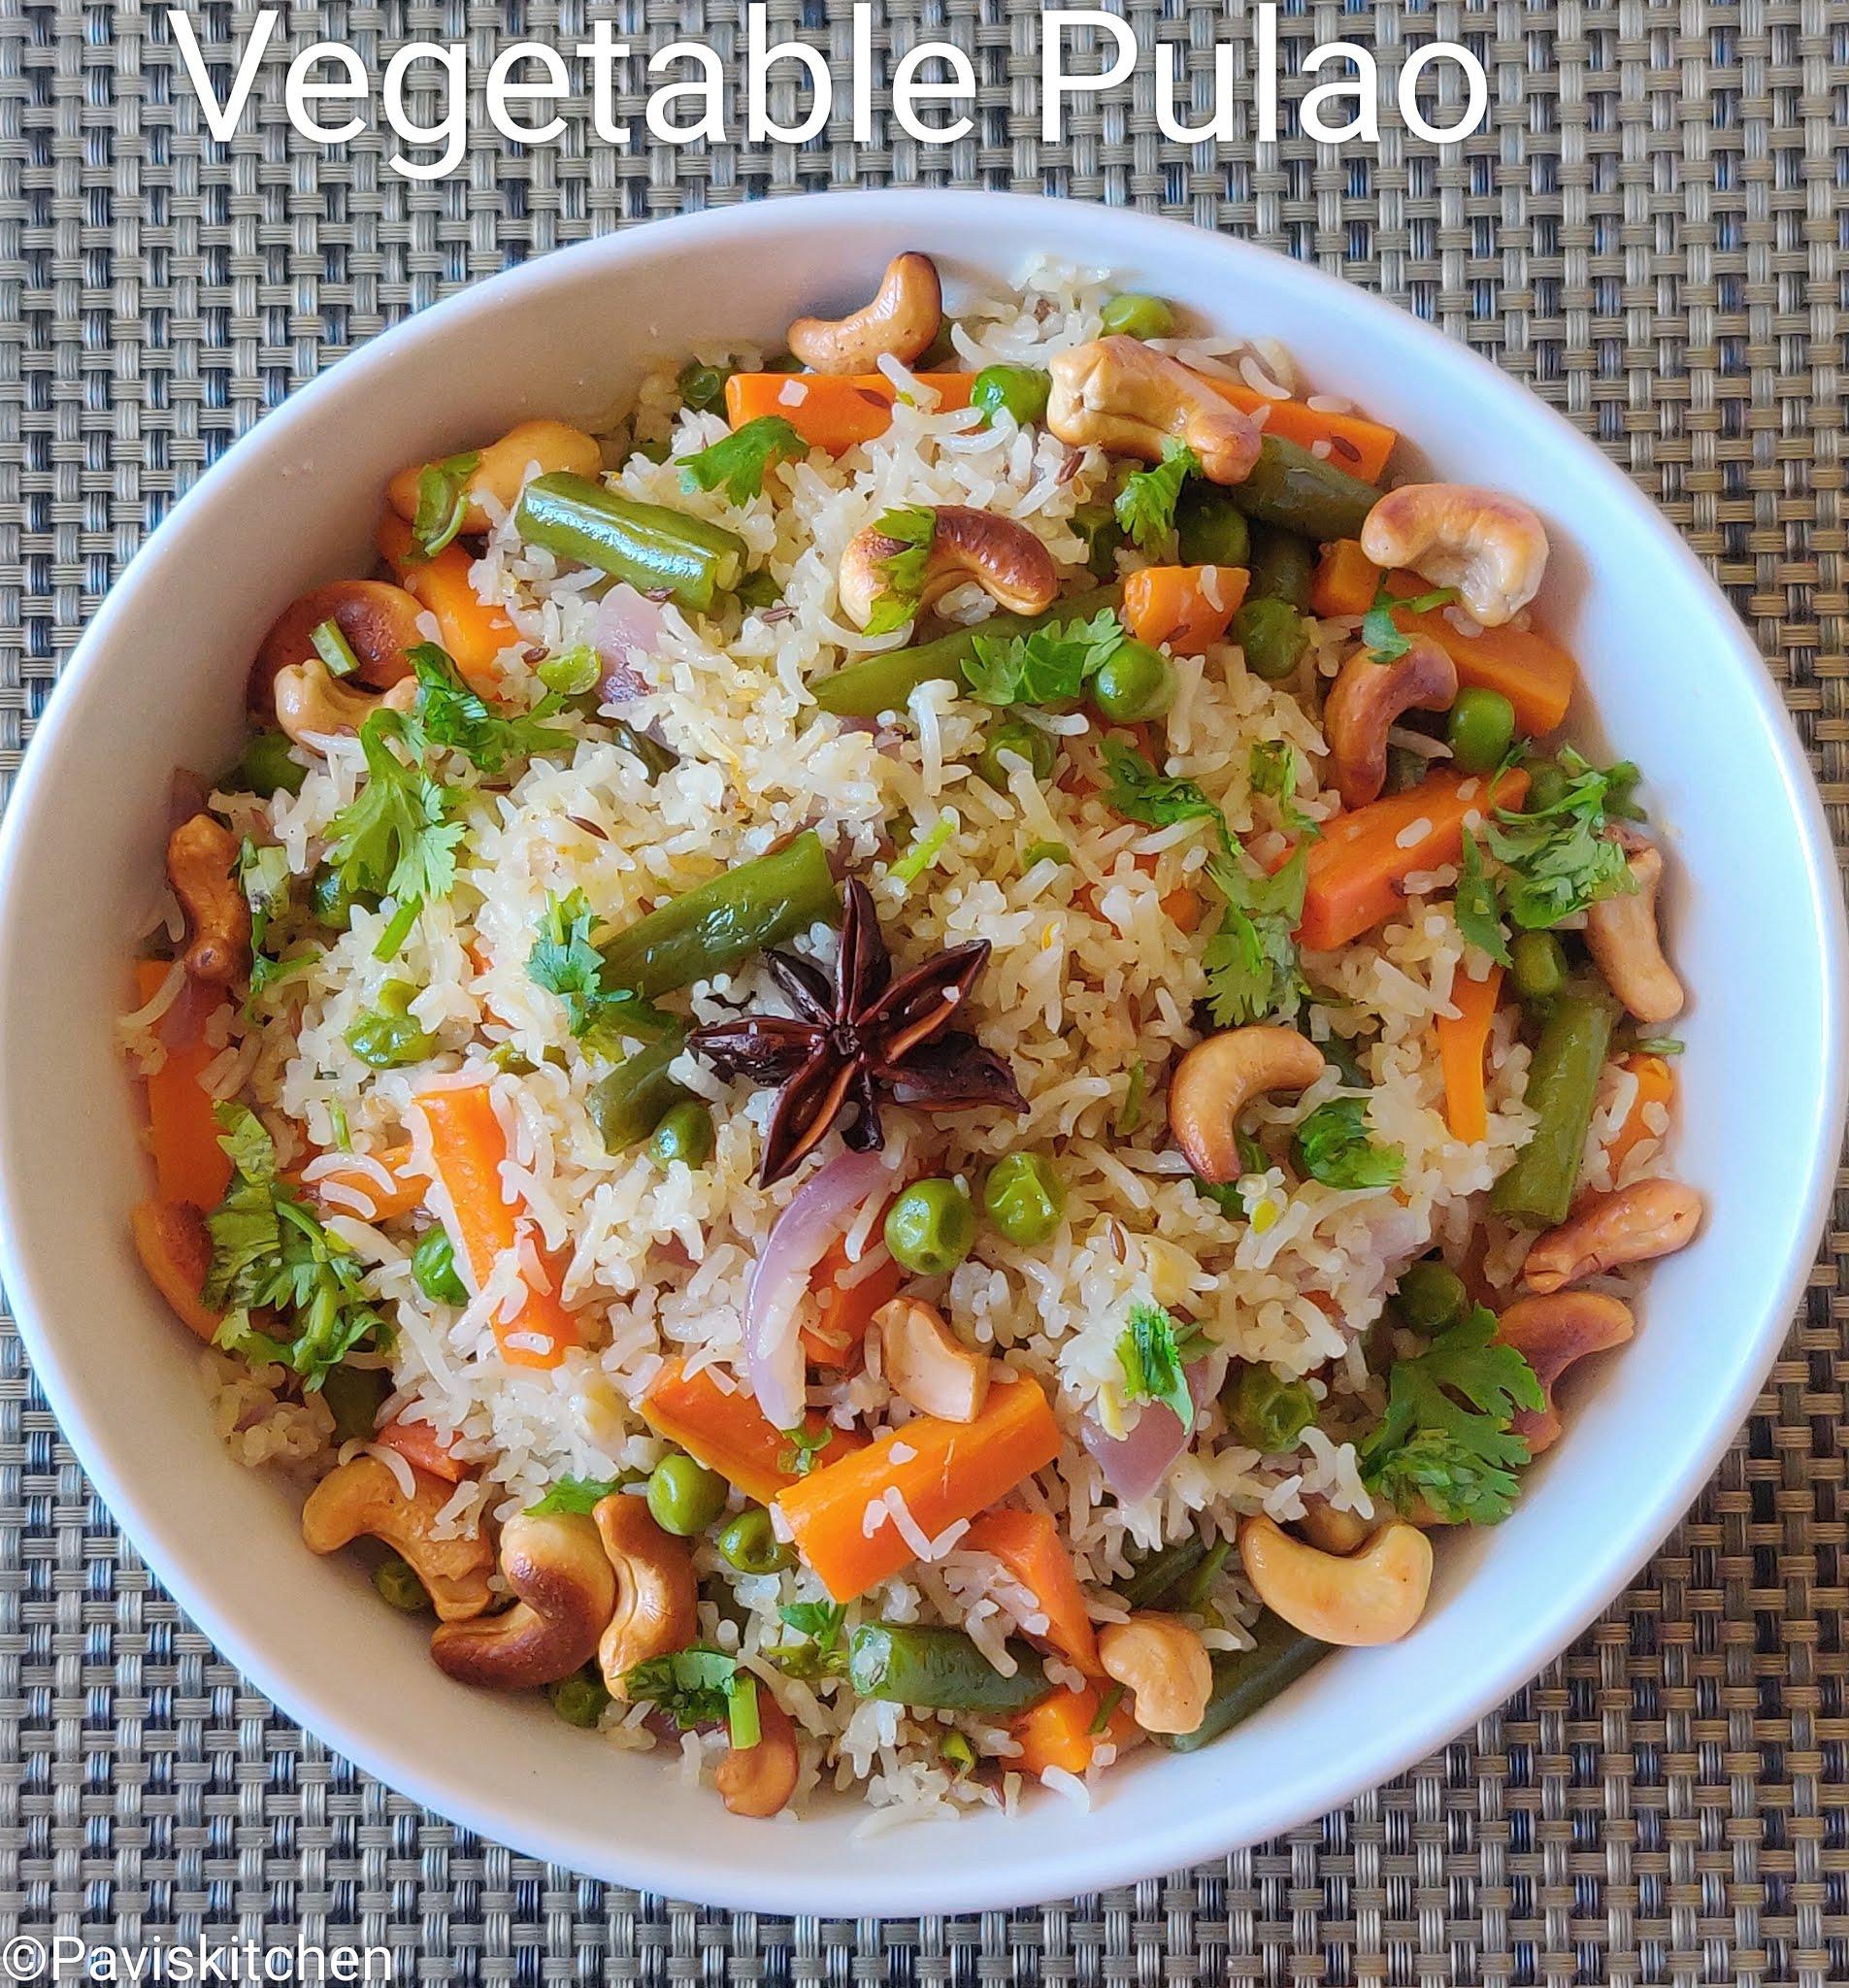 Pulao Recipe | Vegetable Pulav Recipe | One Pot Veg Pulao